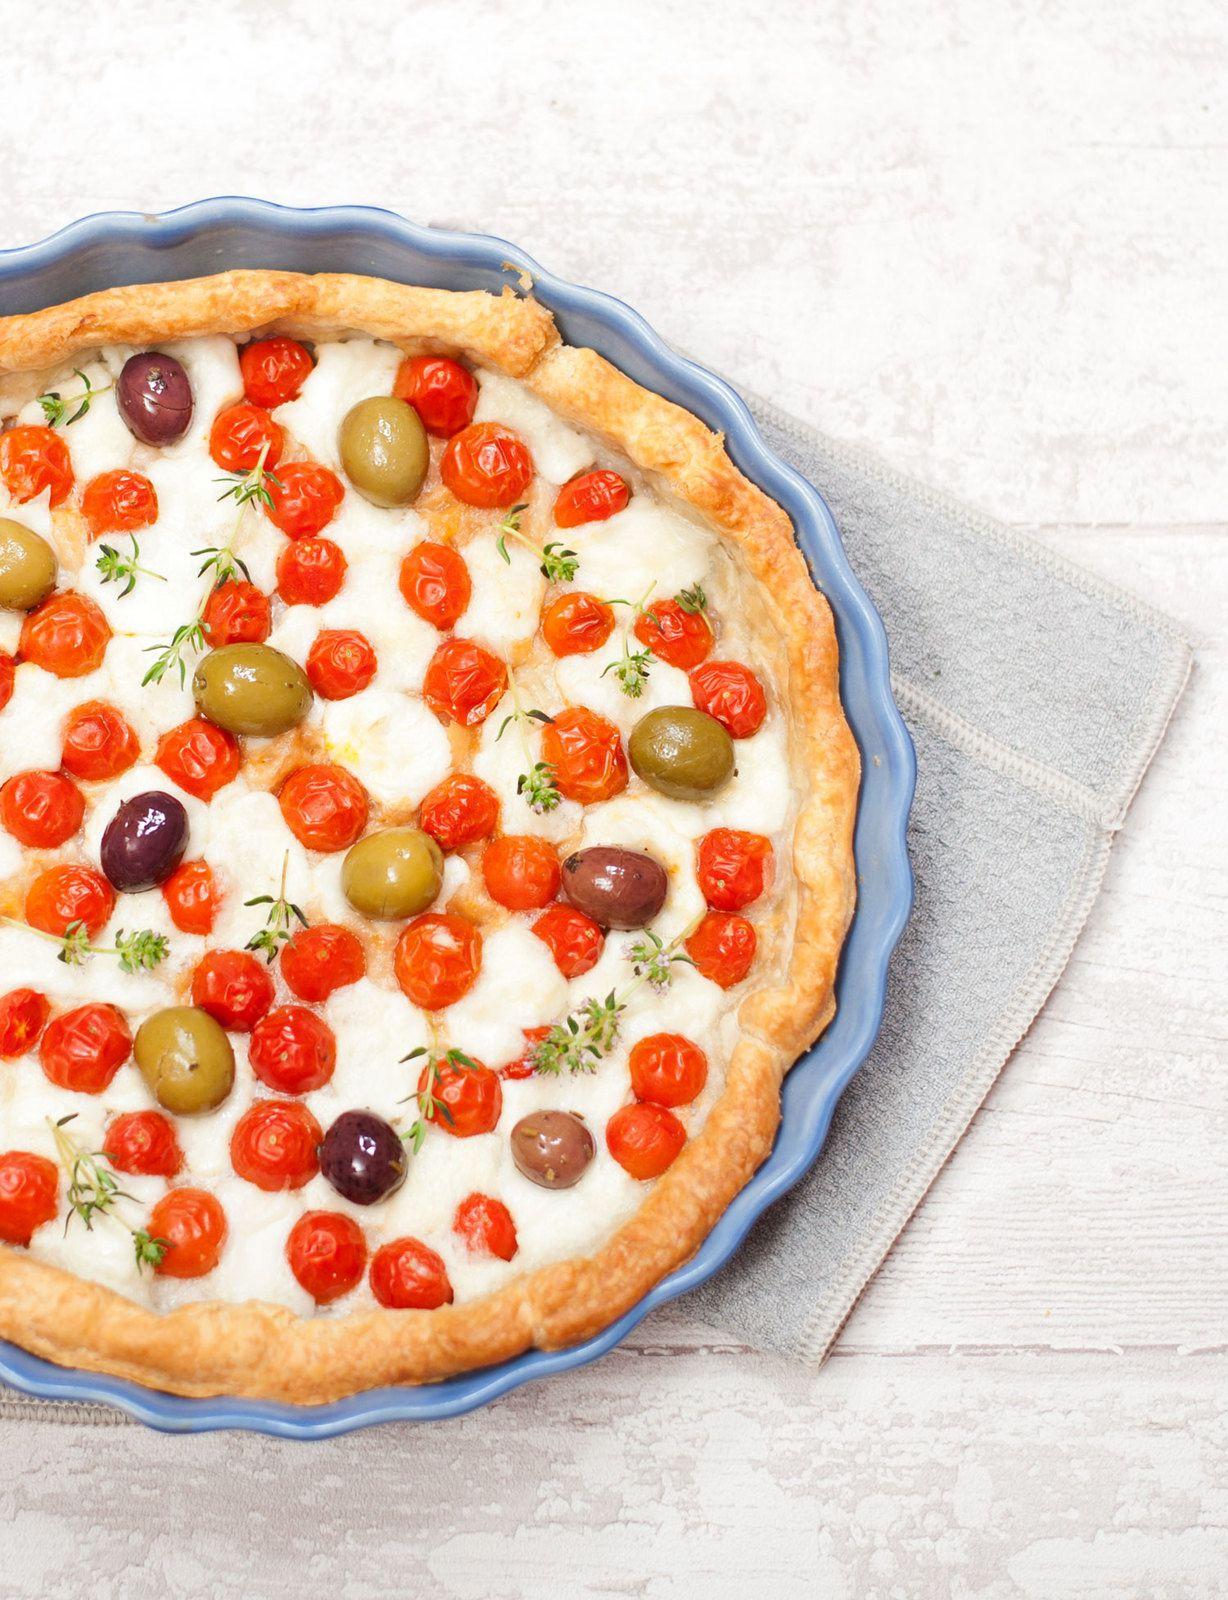 Tarte italienne à la mozzarella, tomates cerises, olives et thym